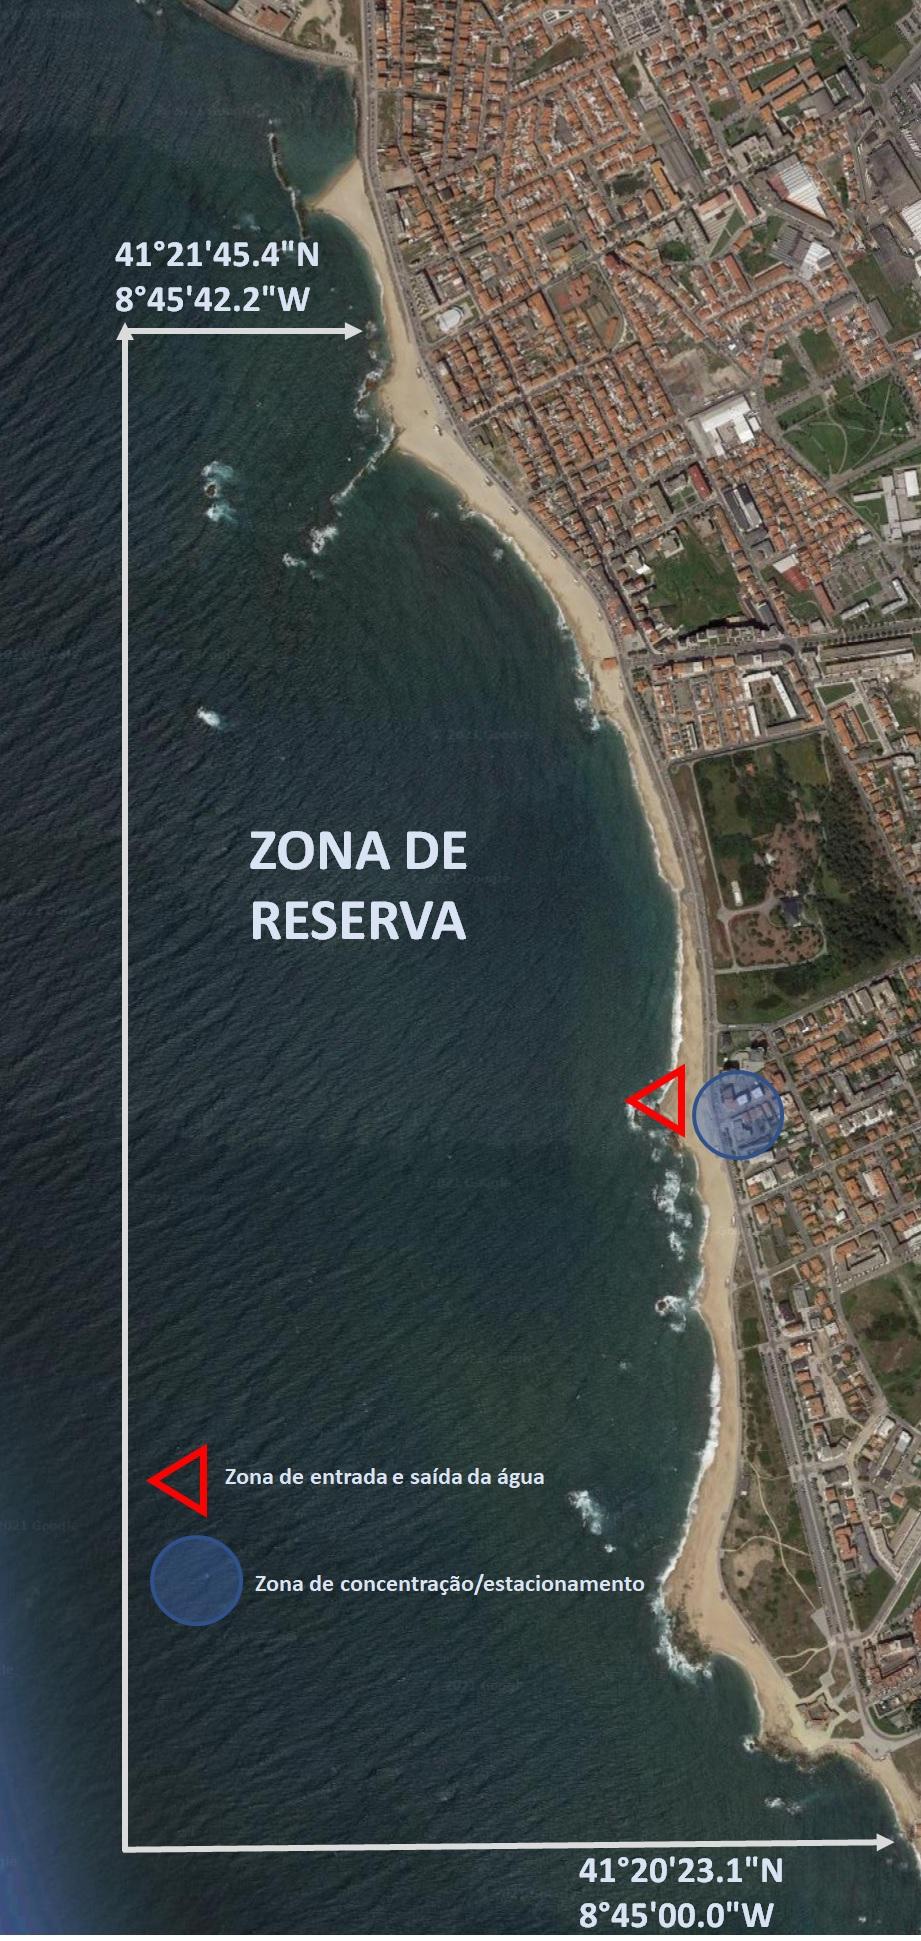 RegionalPescaSubPóvoaVarzim_ZonaReserva.jpg